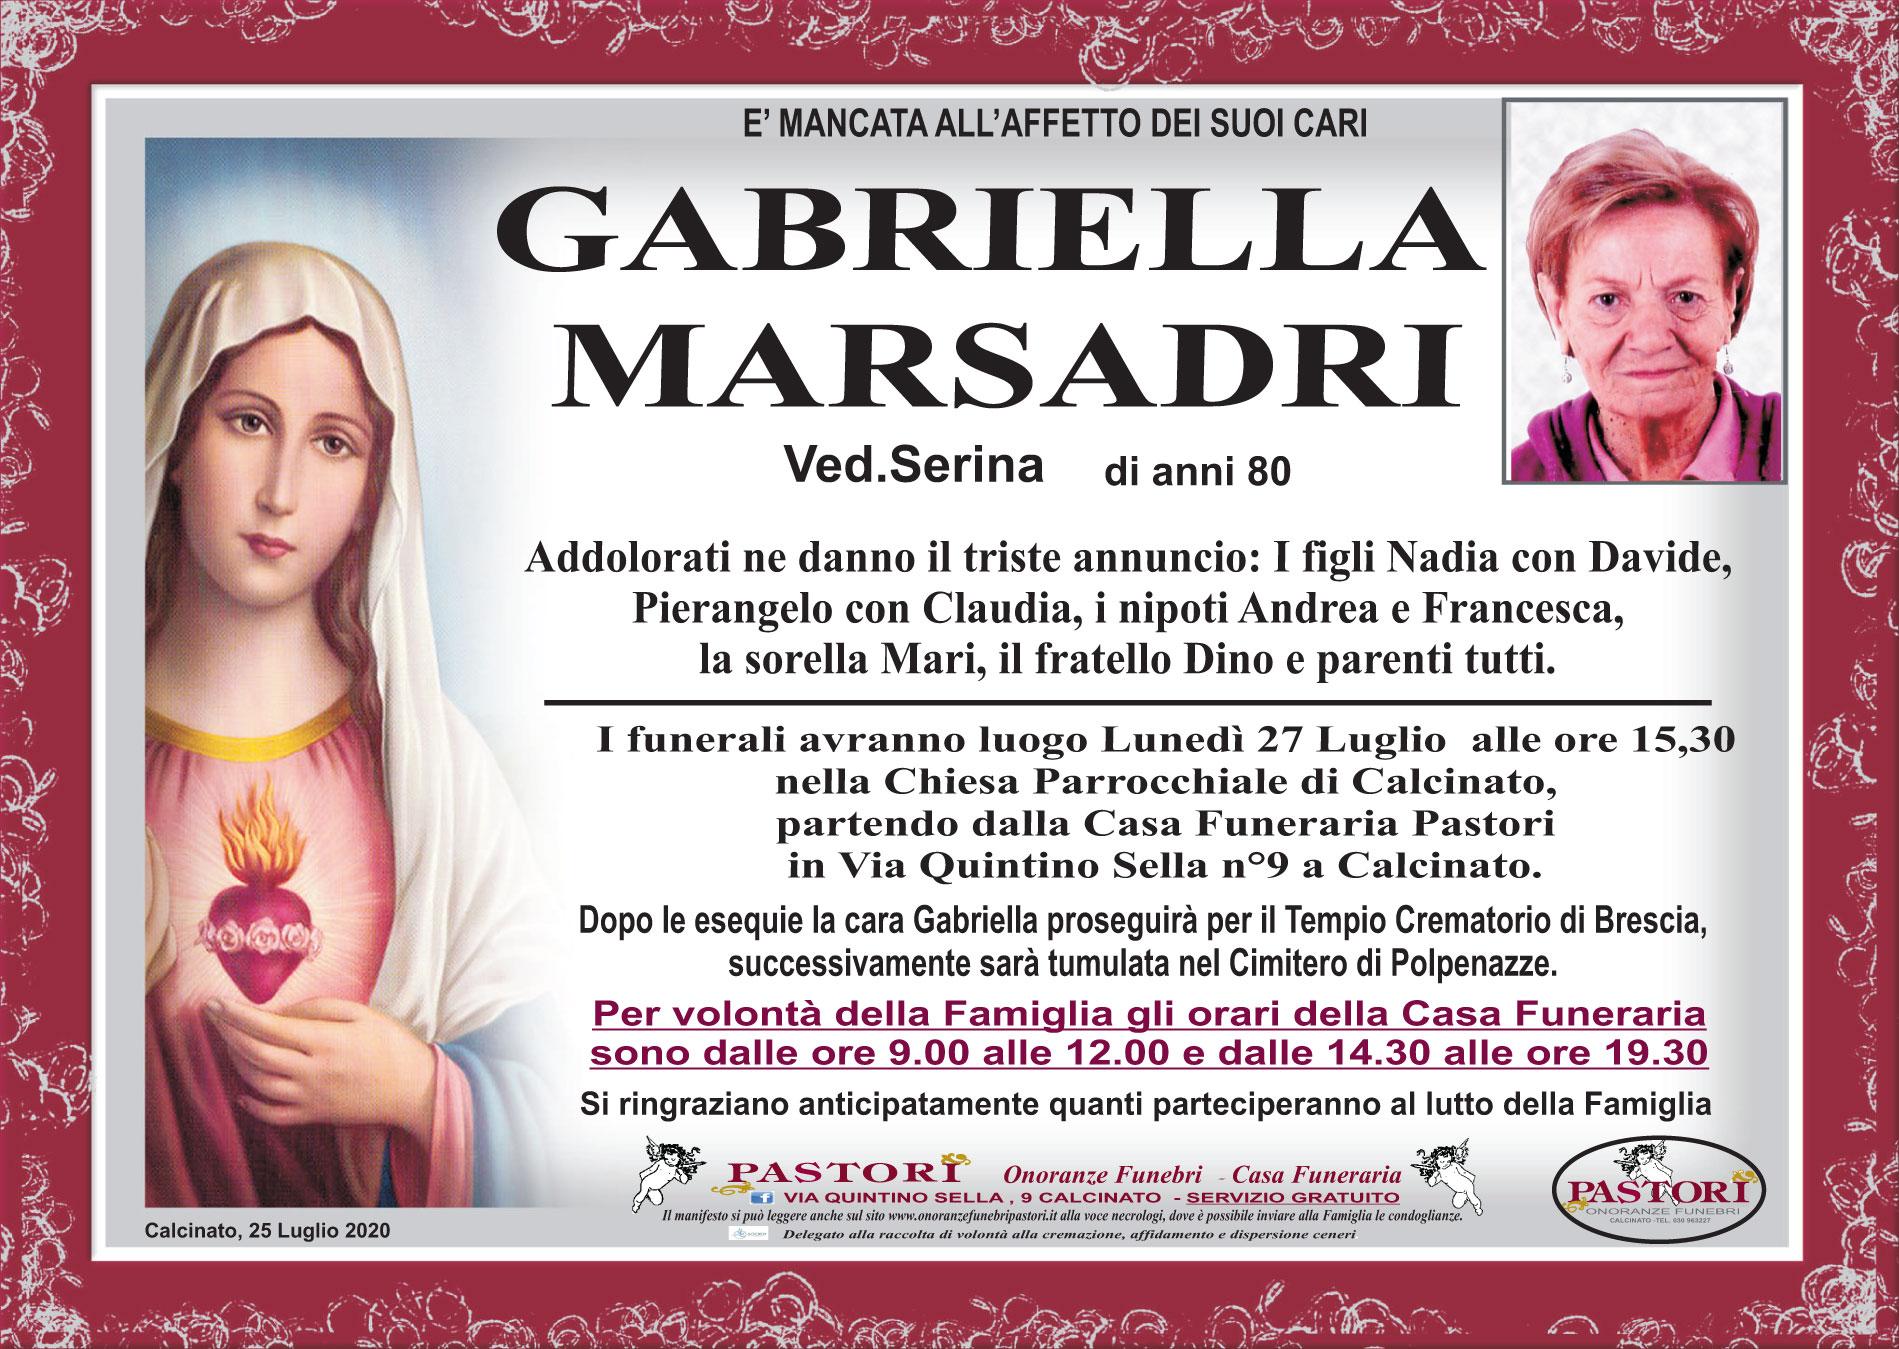 Gabriella Marsadri